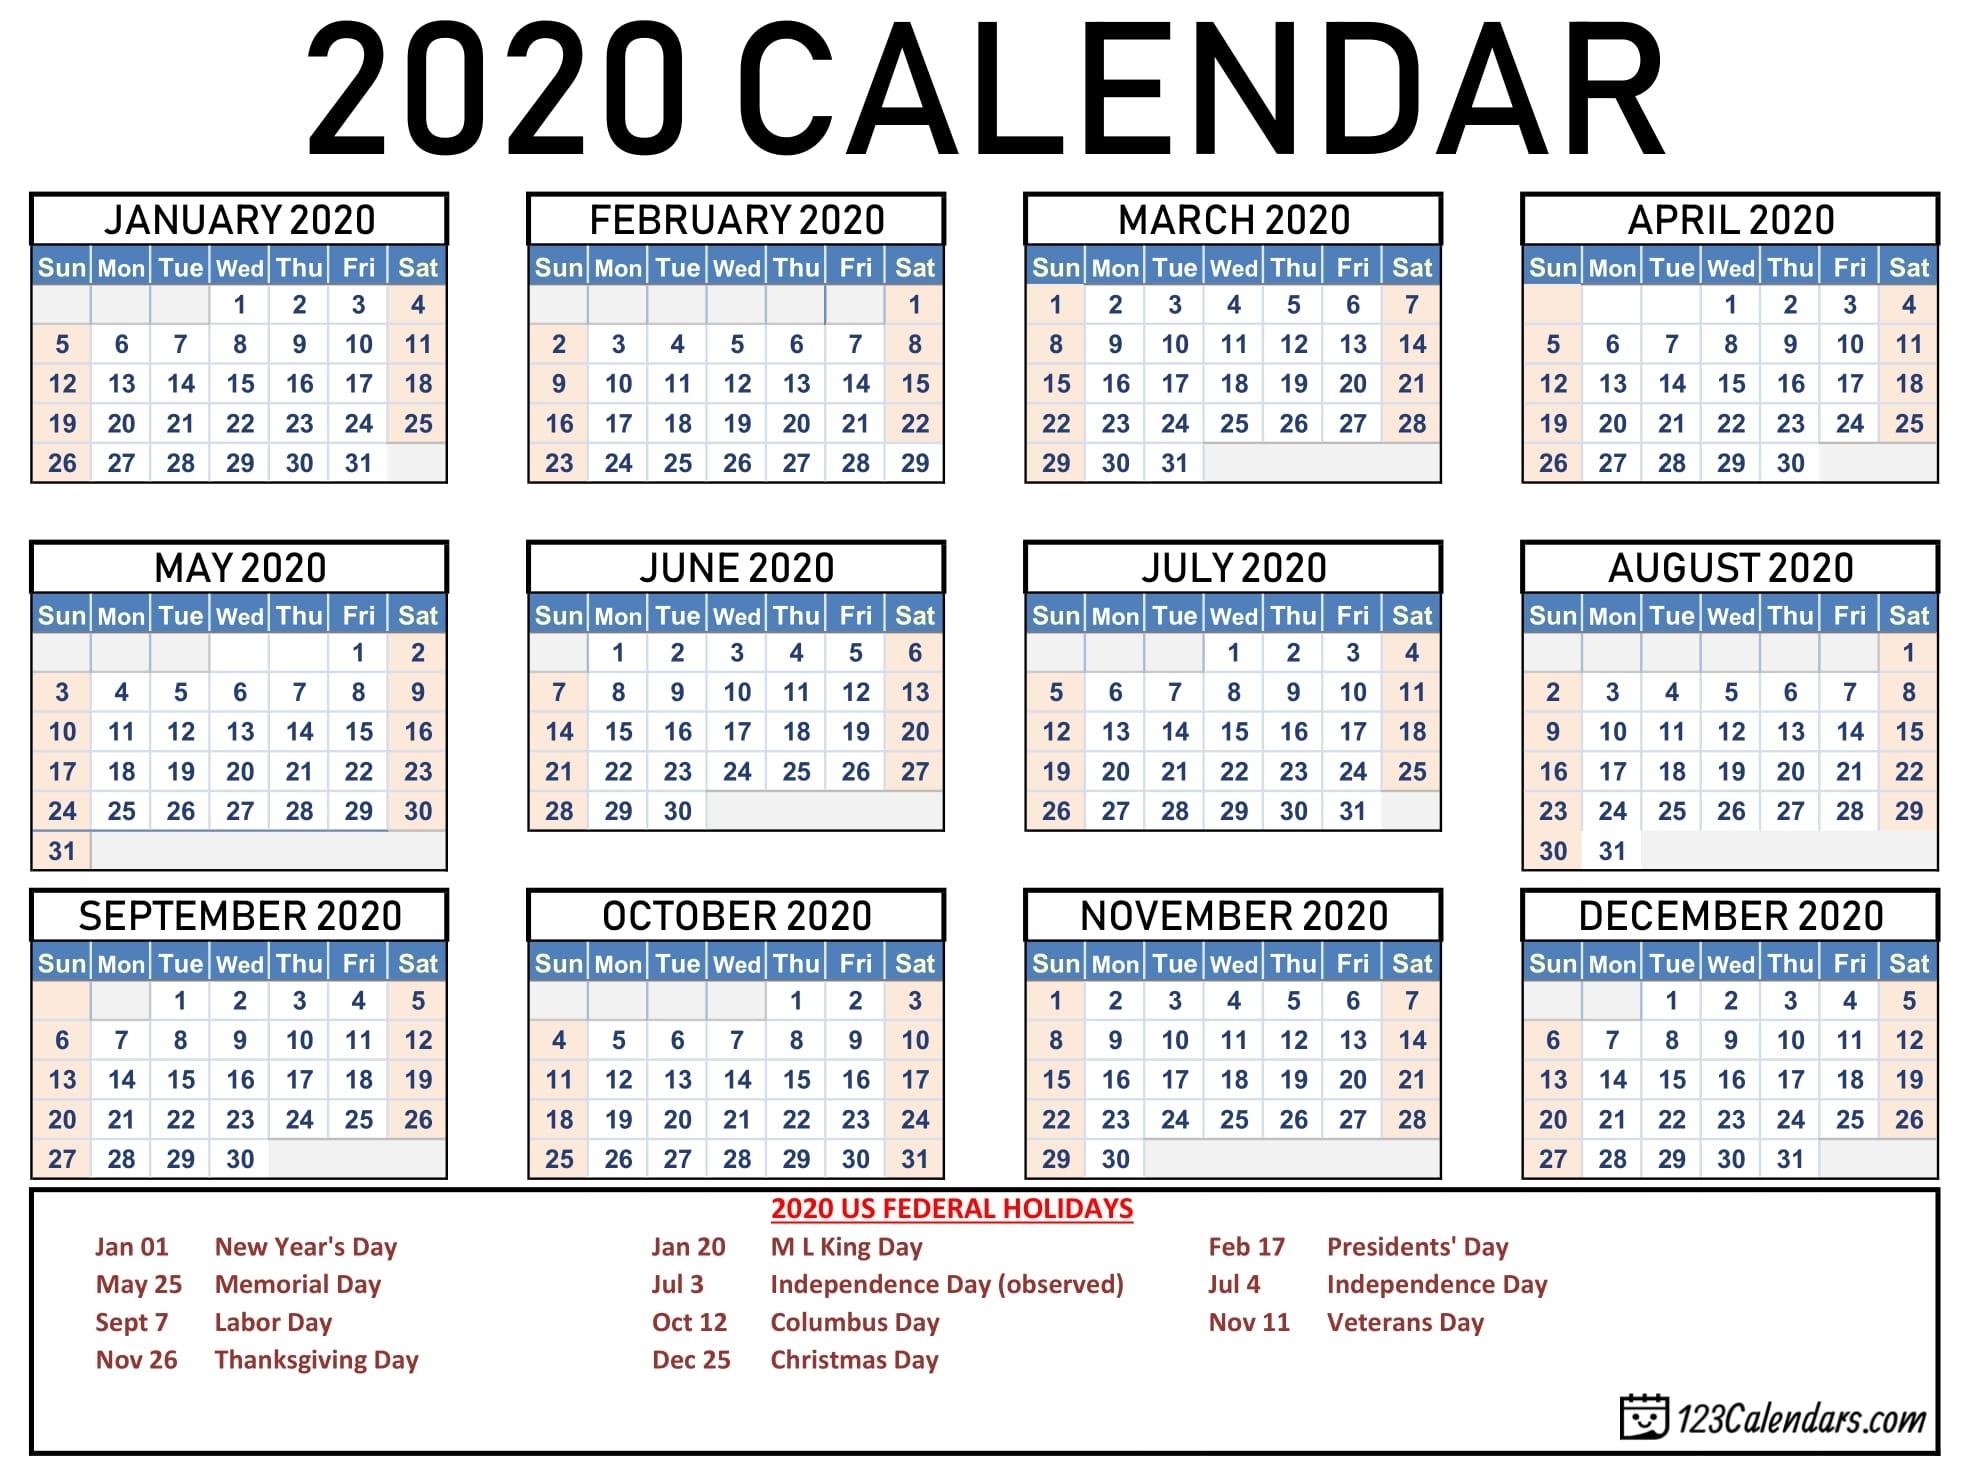 Free Printable 2020 Calendar | 123Calendars intended for 2020 Pocket Size Calendar Free